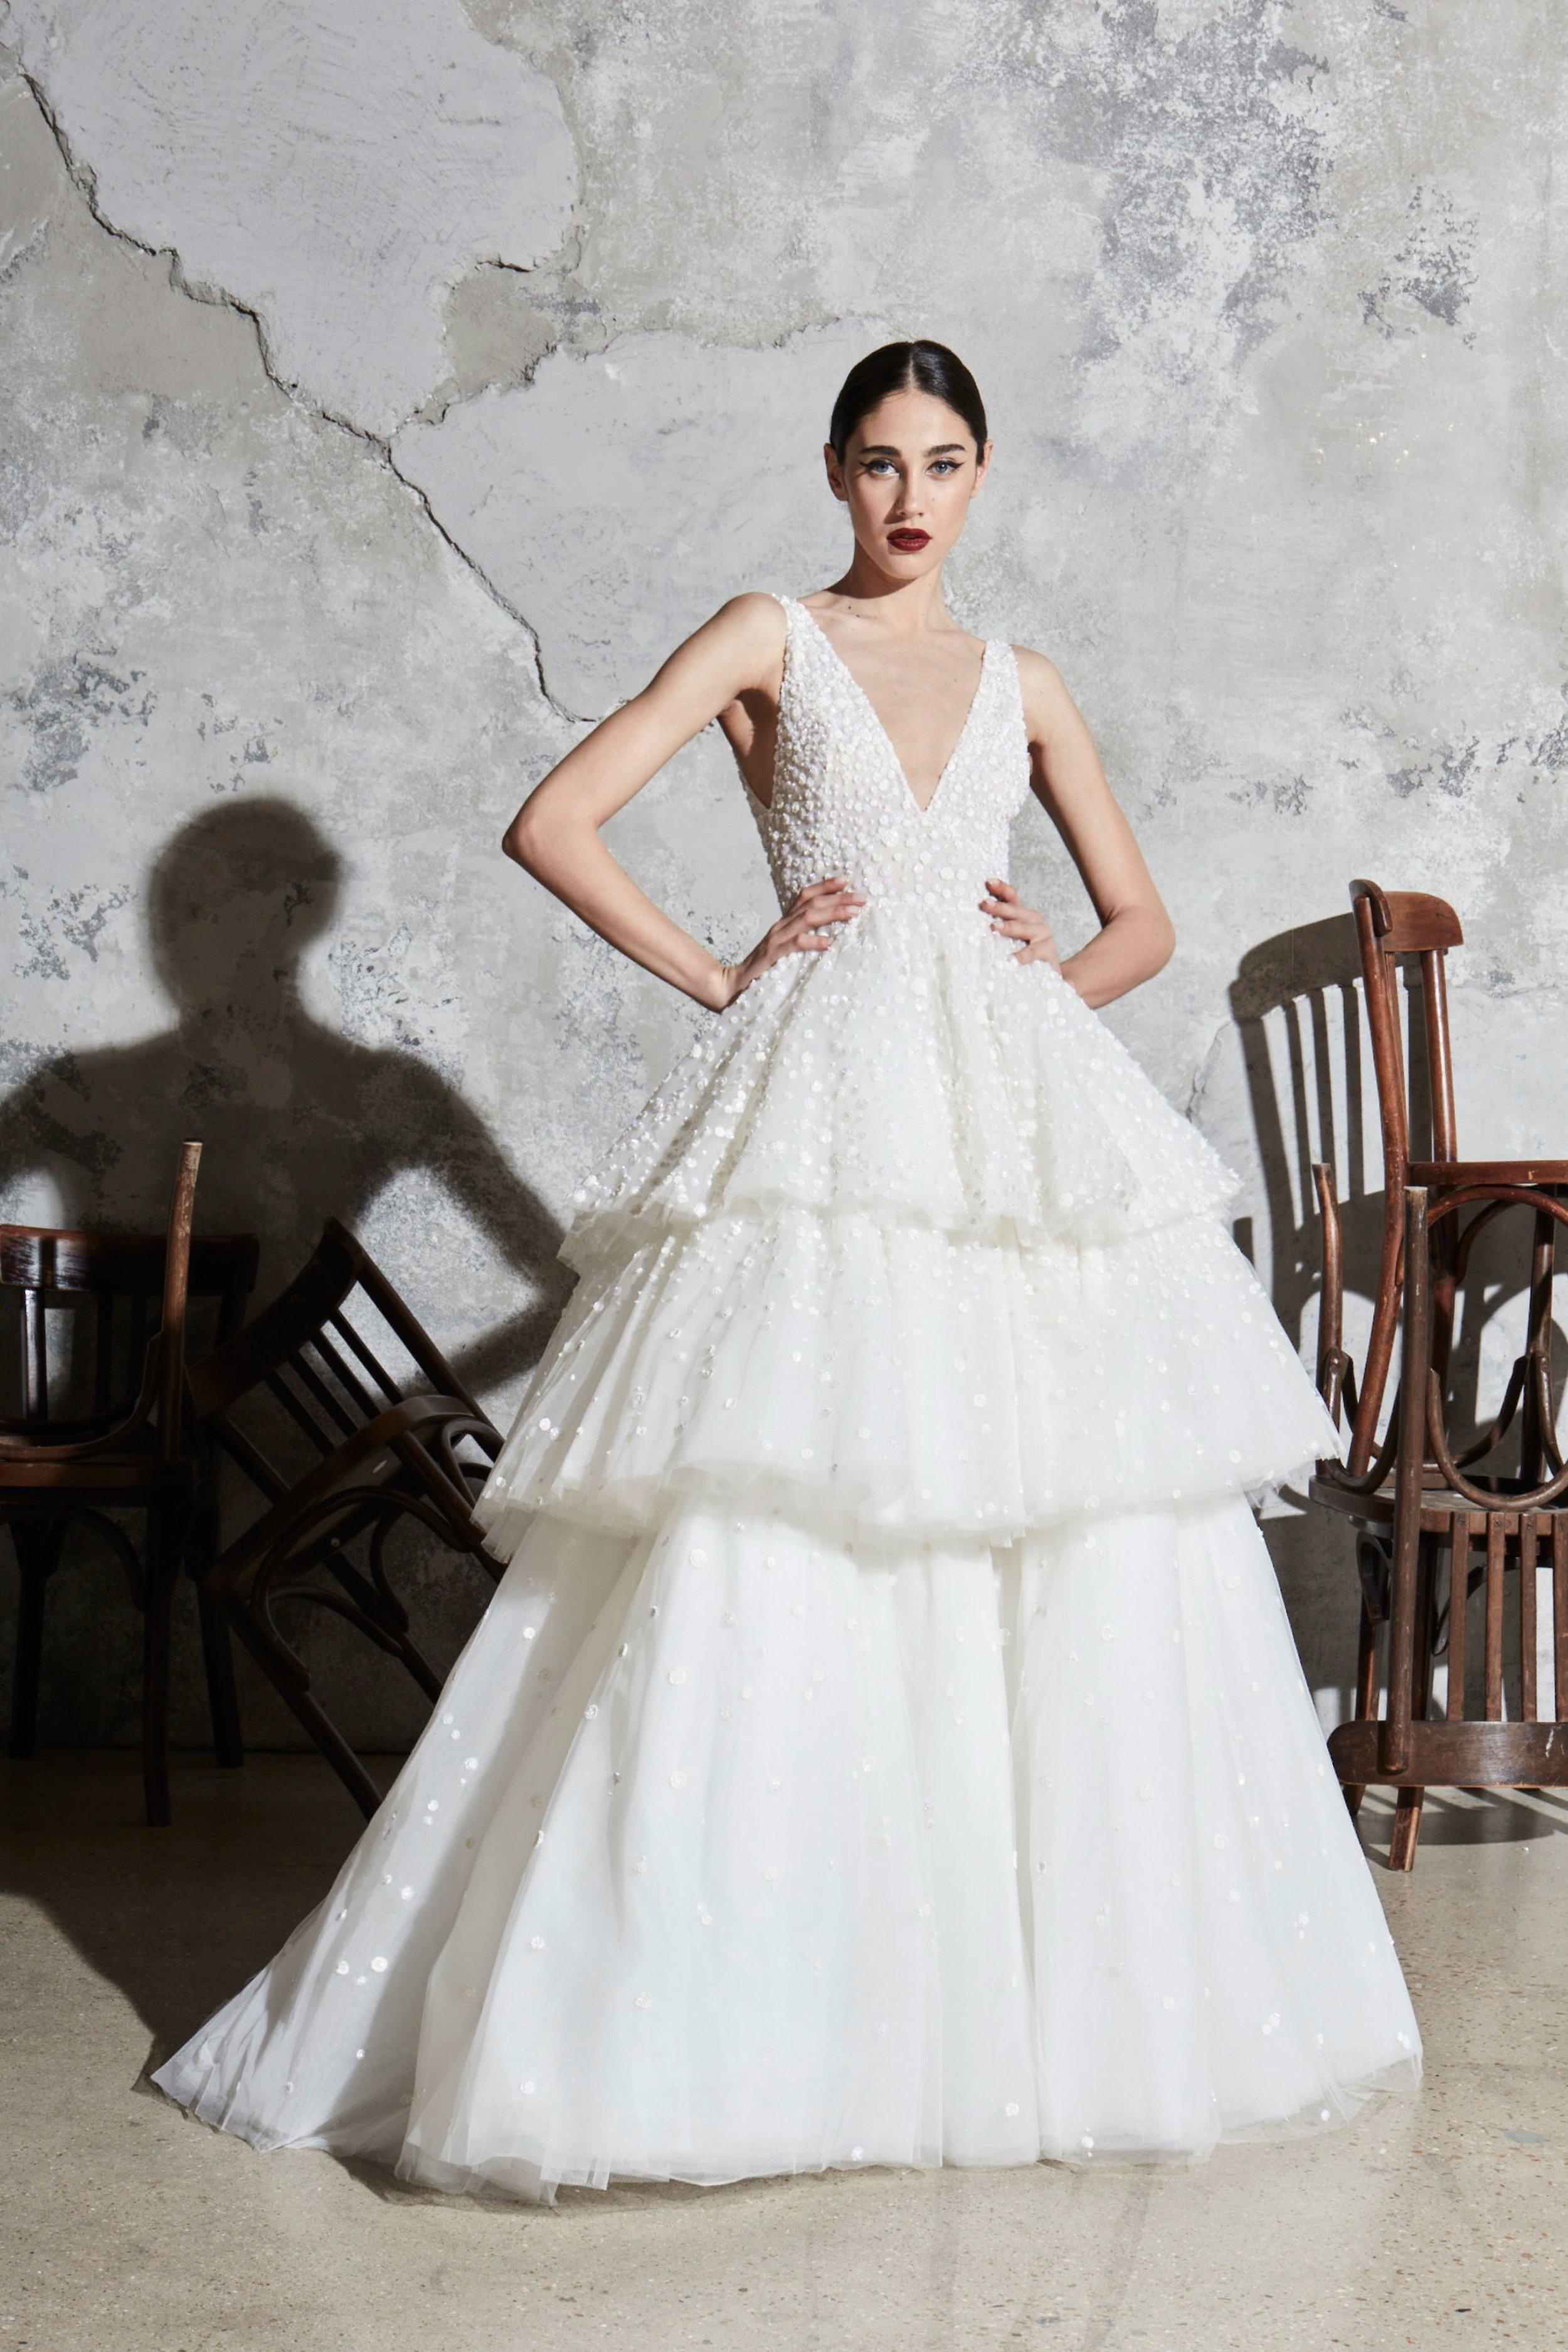 00013-zuhair-murad-new-york-bridal-Spring-2020-CREDIT-Thomas-Nutzl.jpg